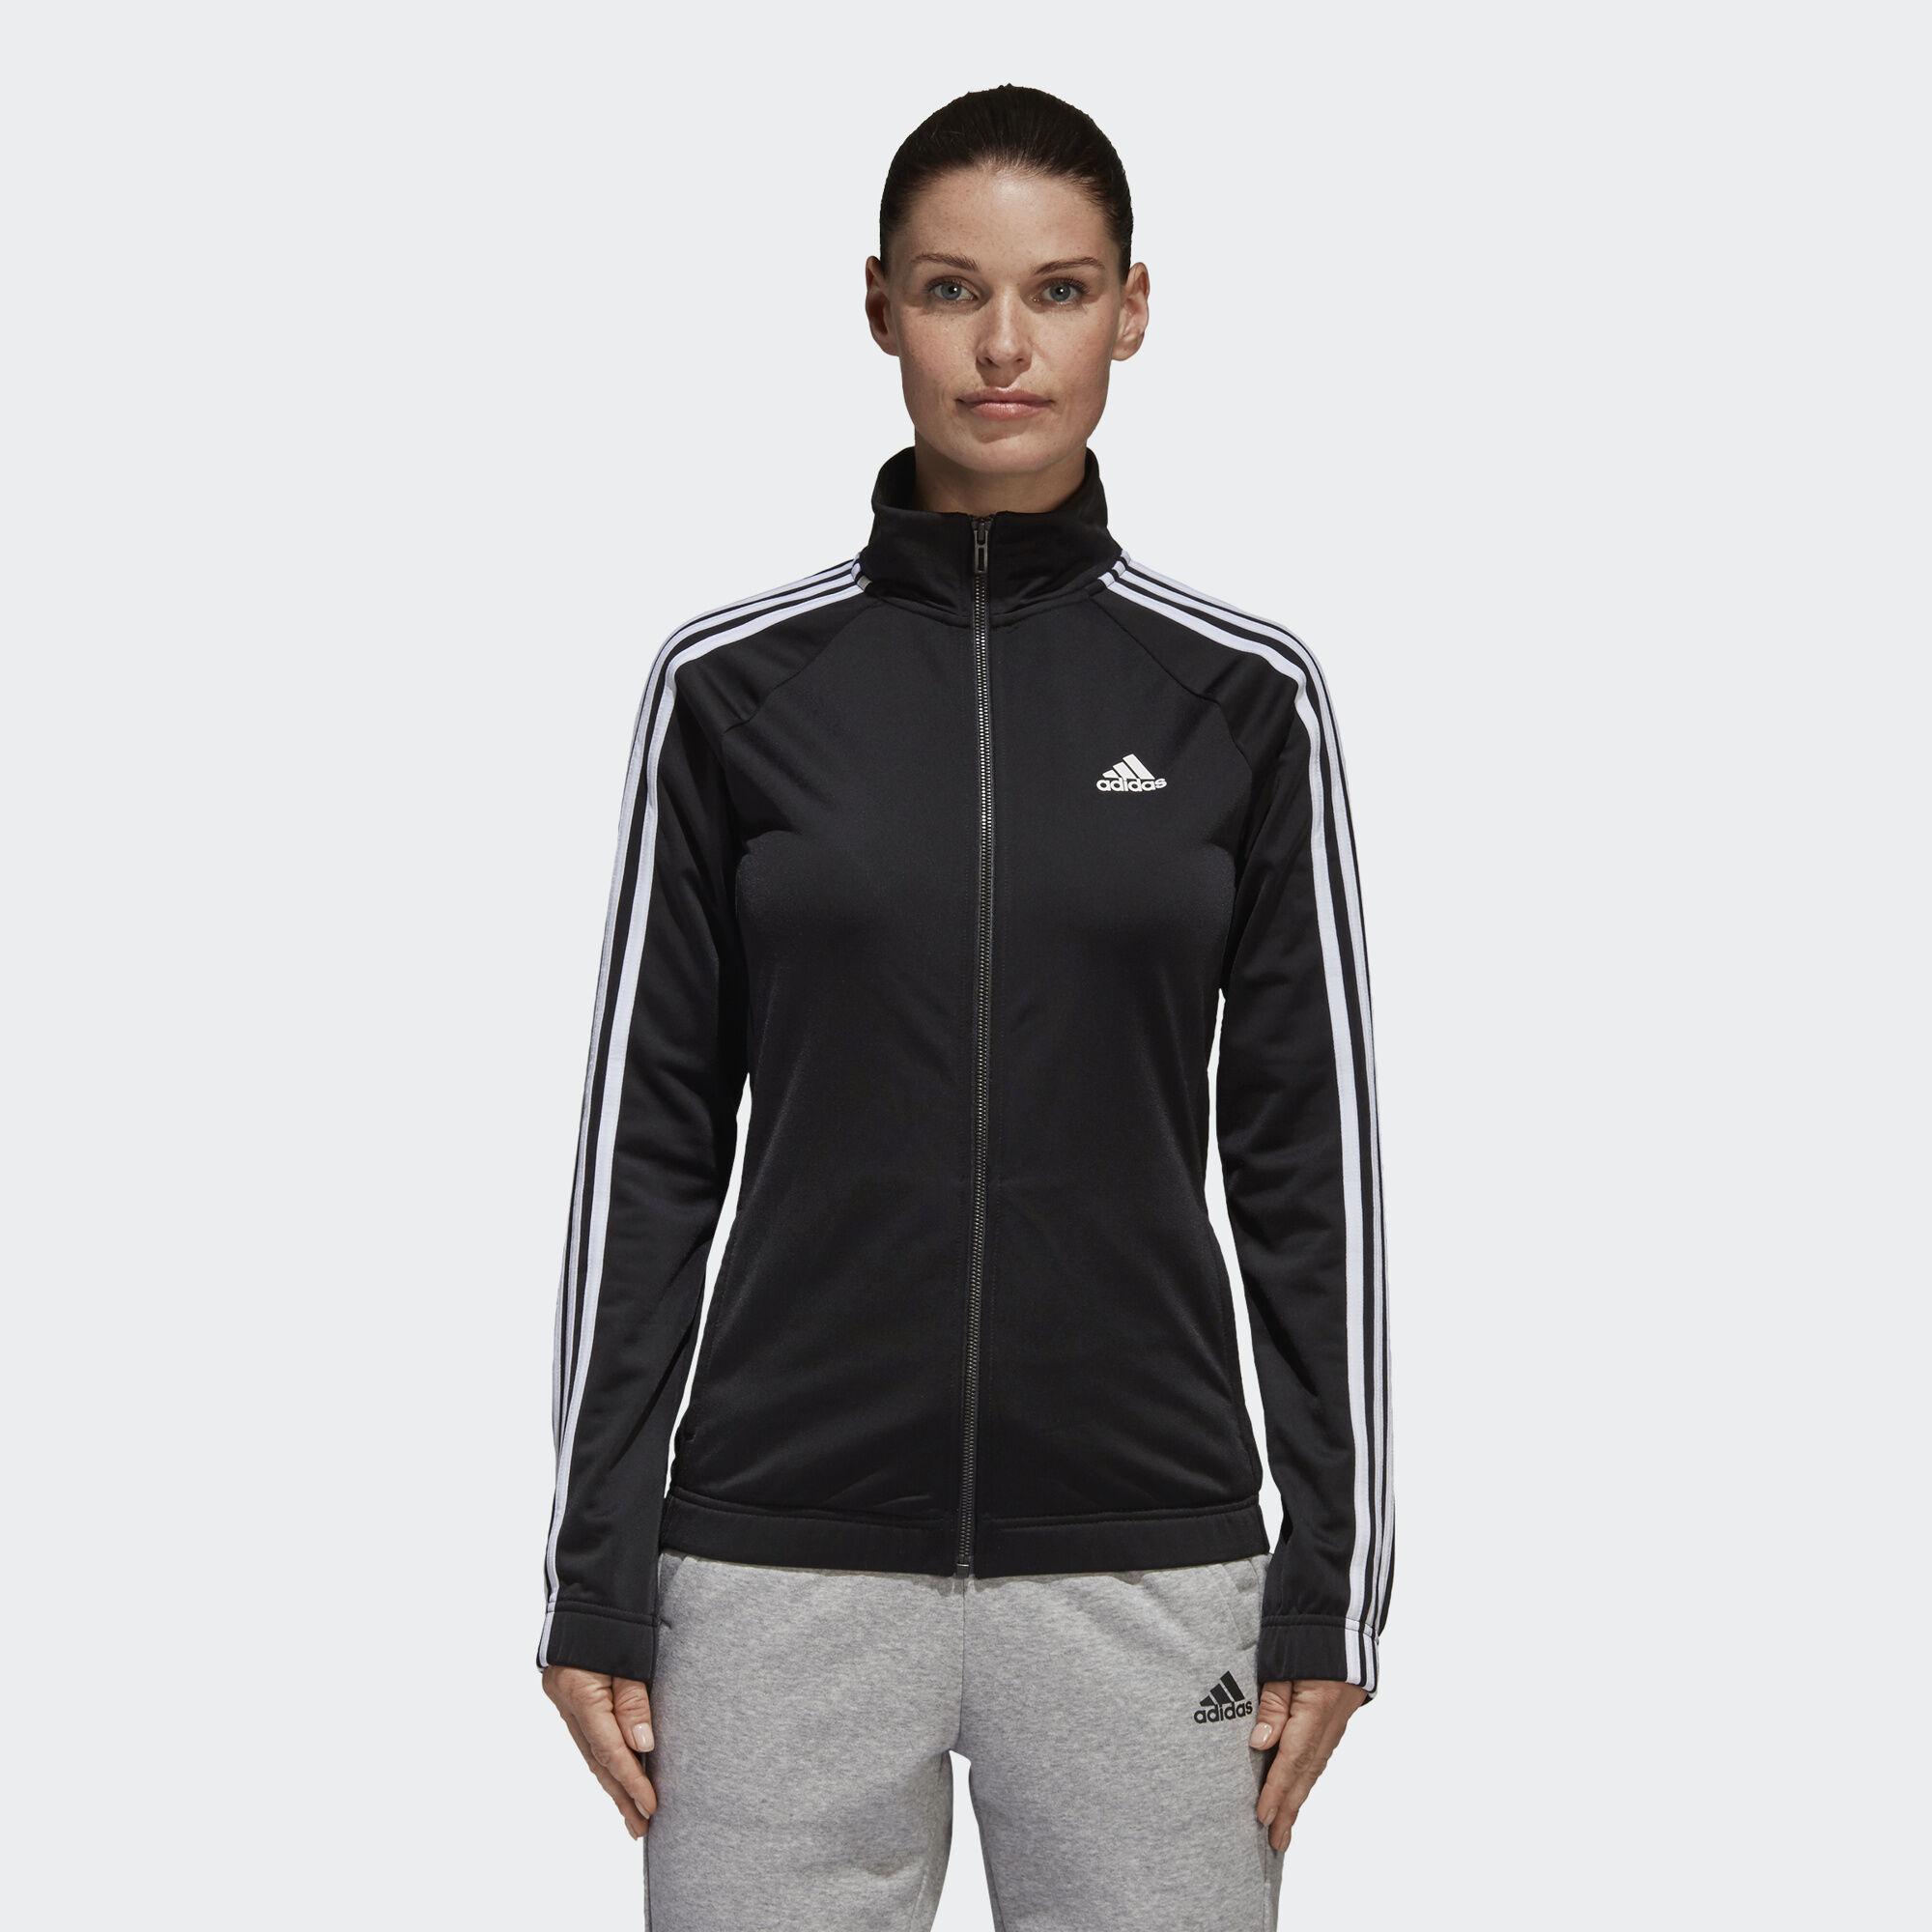 Adidas Winter Coat Womens - Tradingbasis